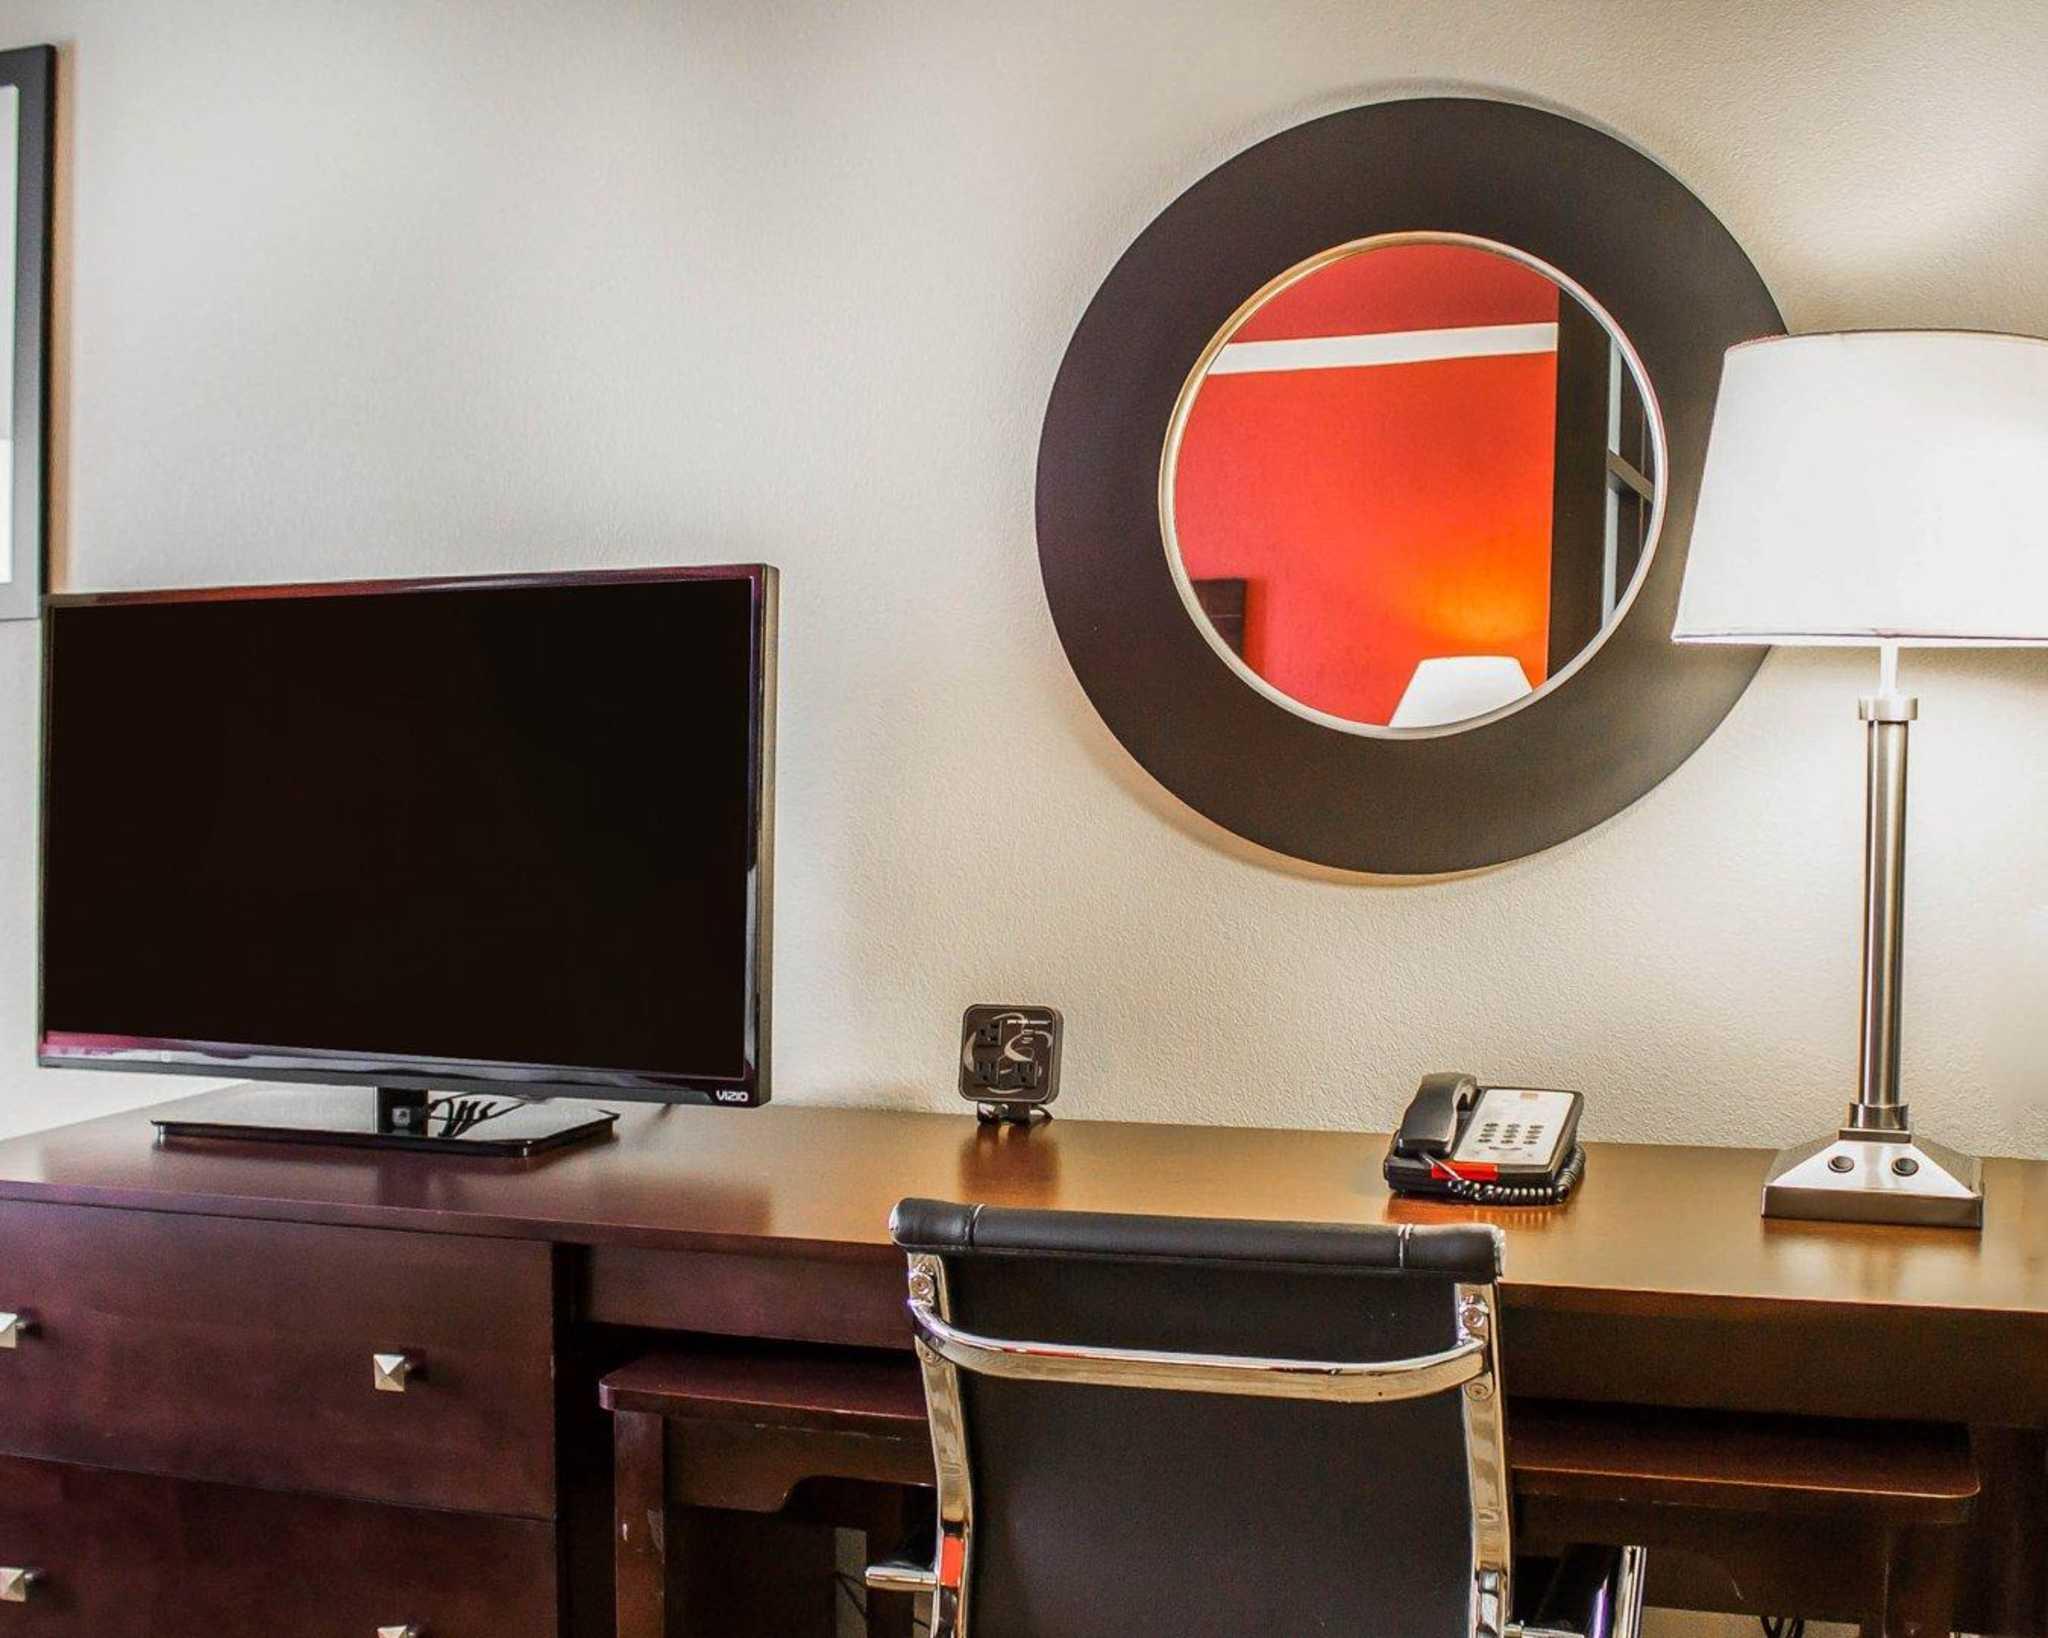 Comfort Suites East Broad at 270 image 33